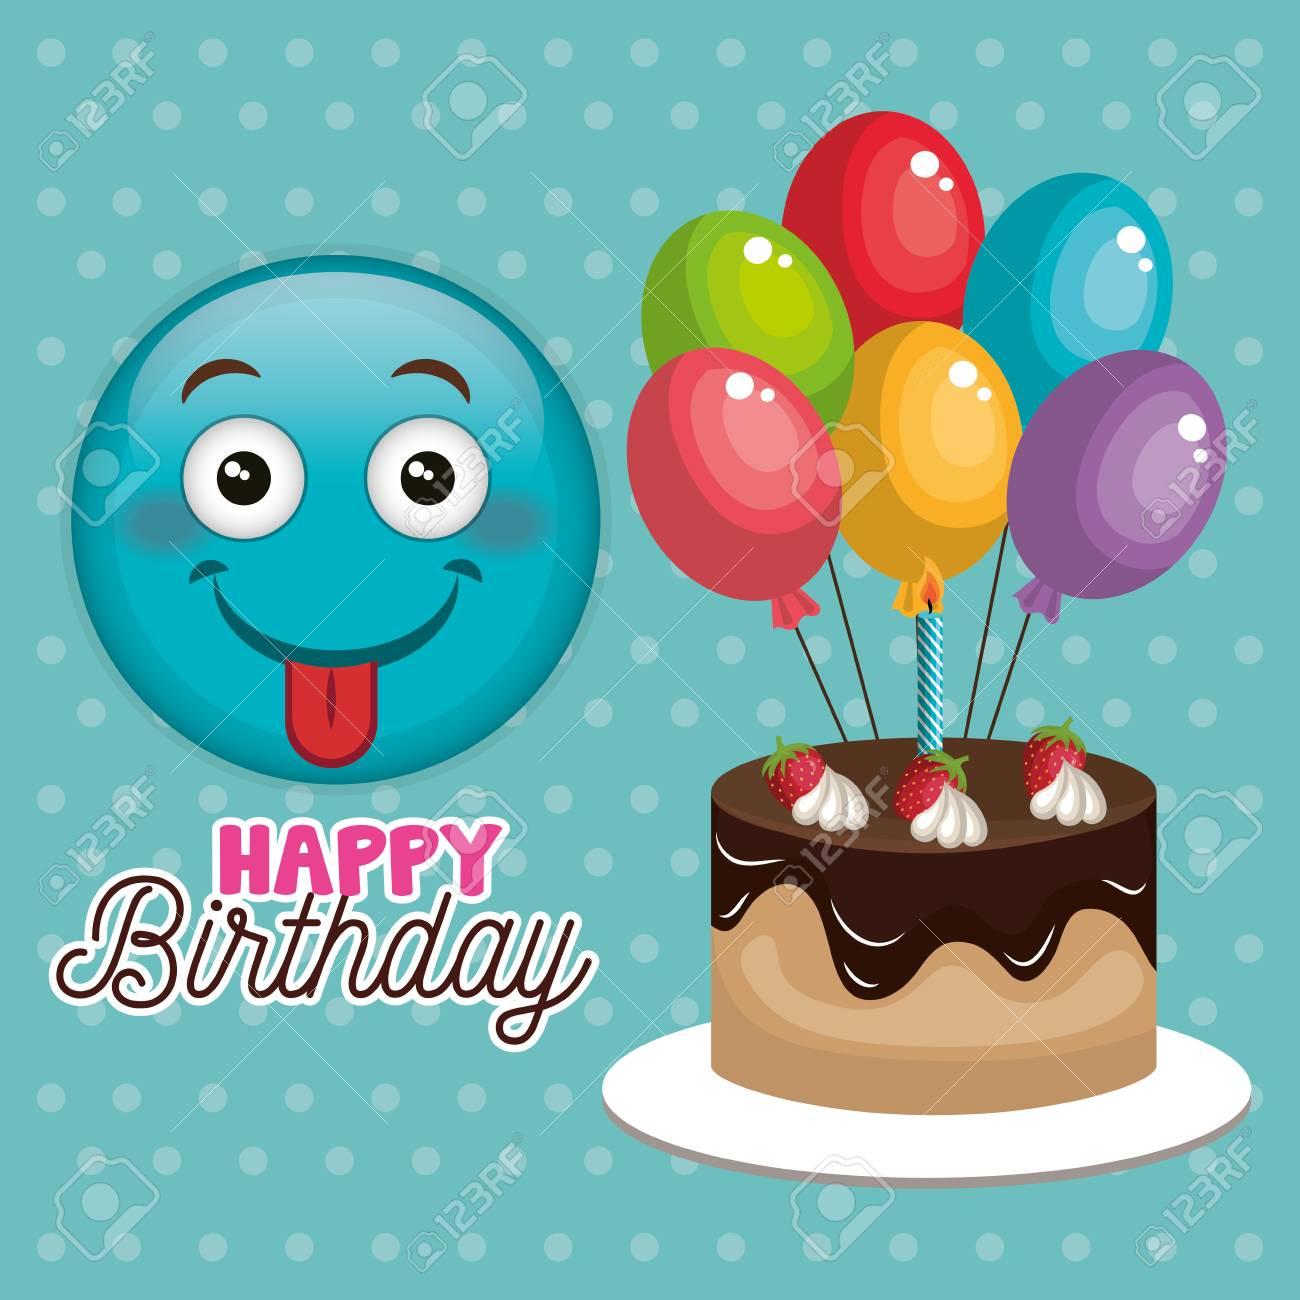 Sensational A Happy Birthday Card With Emoticon Vector Illustration Design Funny Birthday Cards Online Amentibdeldamsfinfo